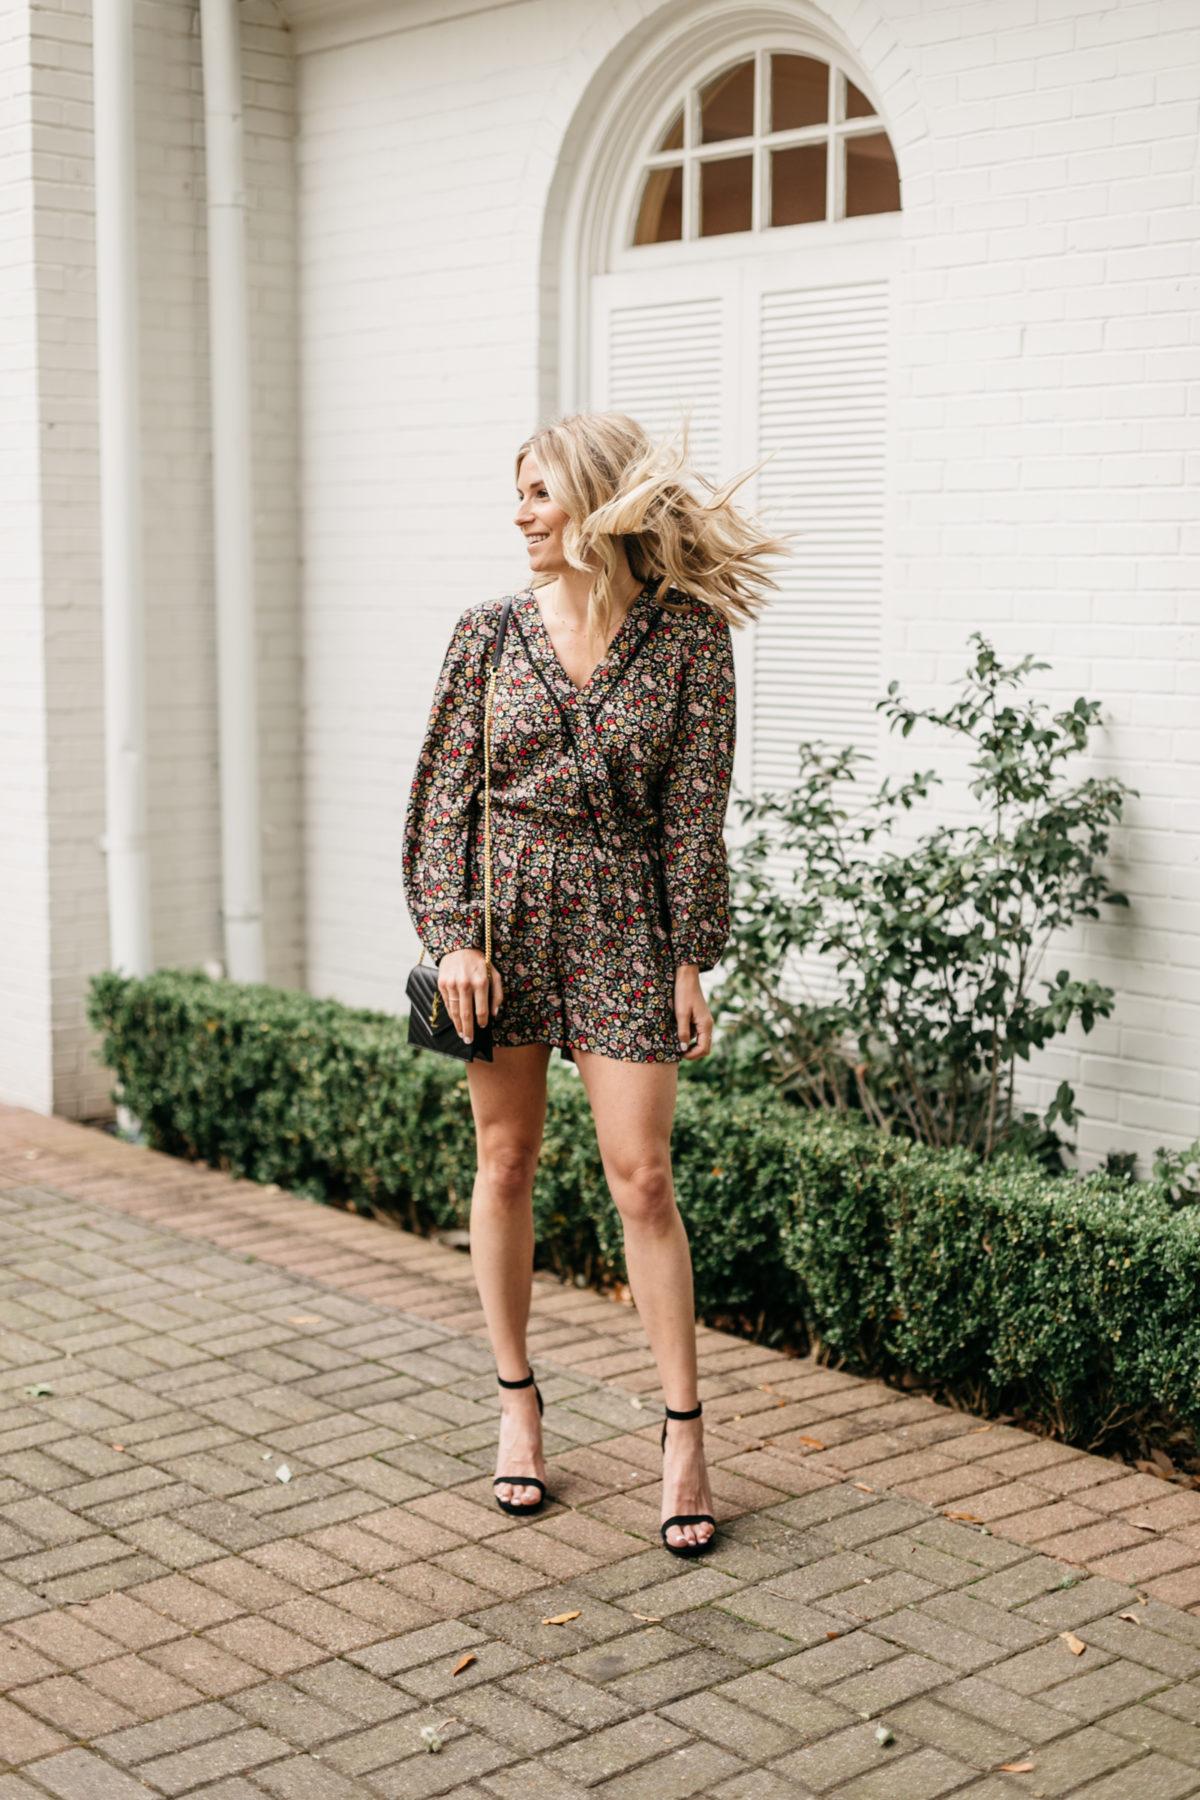 Spring Rompers - Brooke's outfit details: Floral Romper // Black Heels // YSL Crossbody